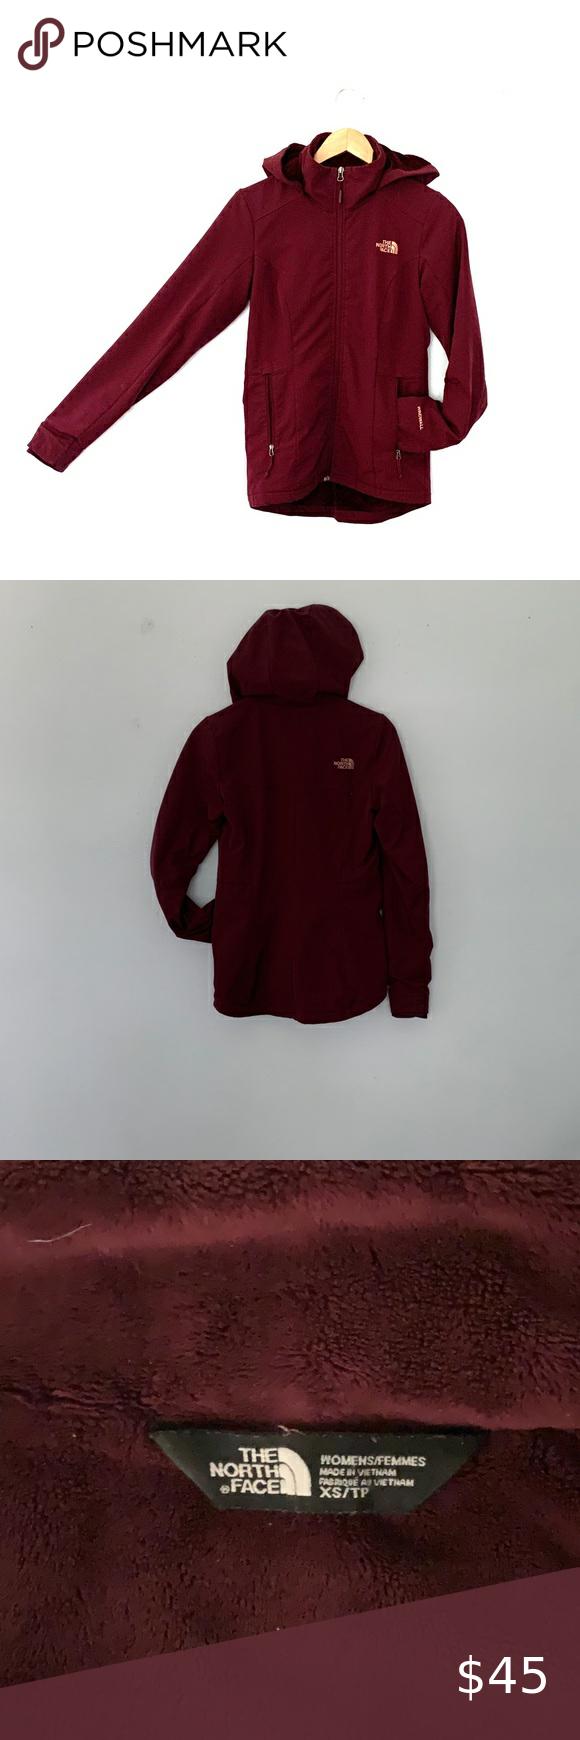 The North Face Jacket Coat North Face Jacket The North Face Coats Jackets [ 1740 x 580 Pixel ]